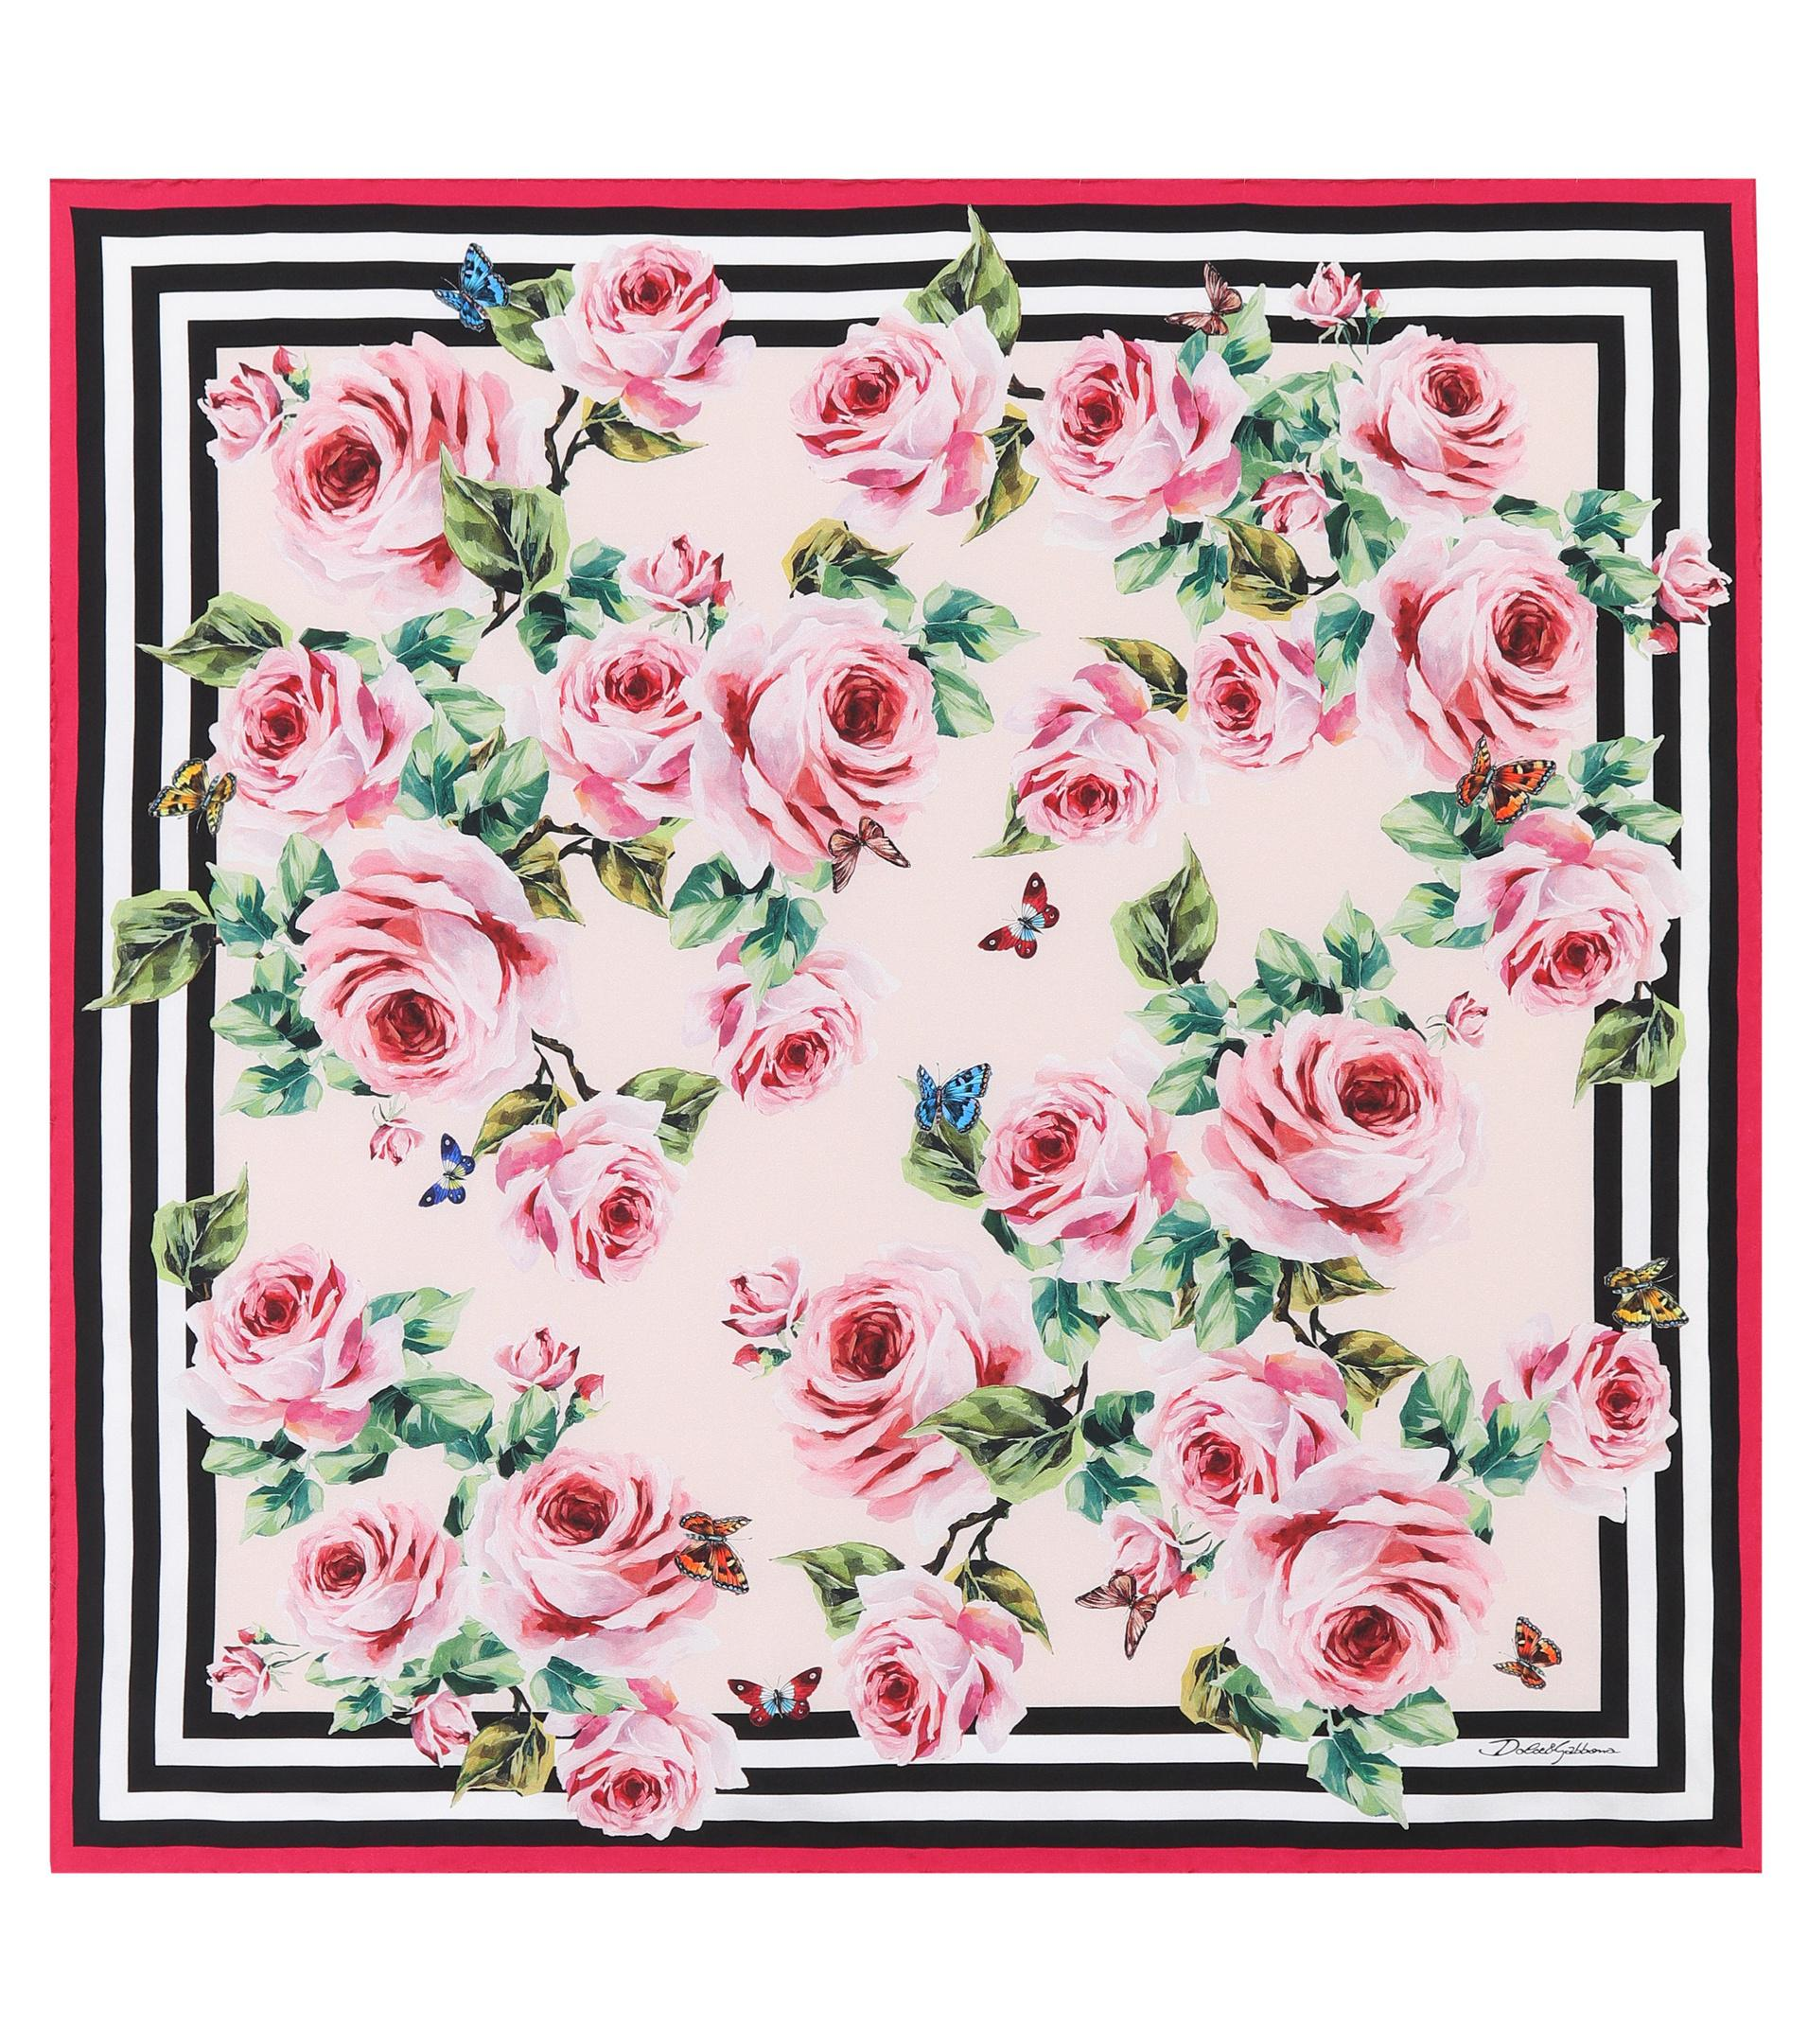 a02cf440 Dolce & Gabbana Floral-printed Silk Scarf in Pink - Lyst